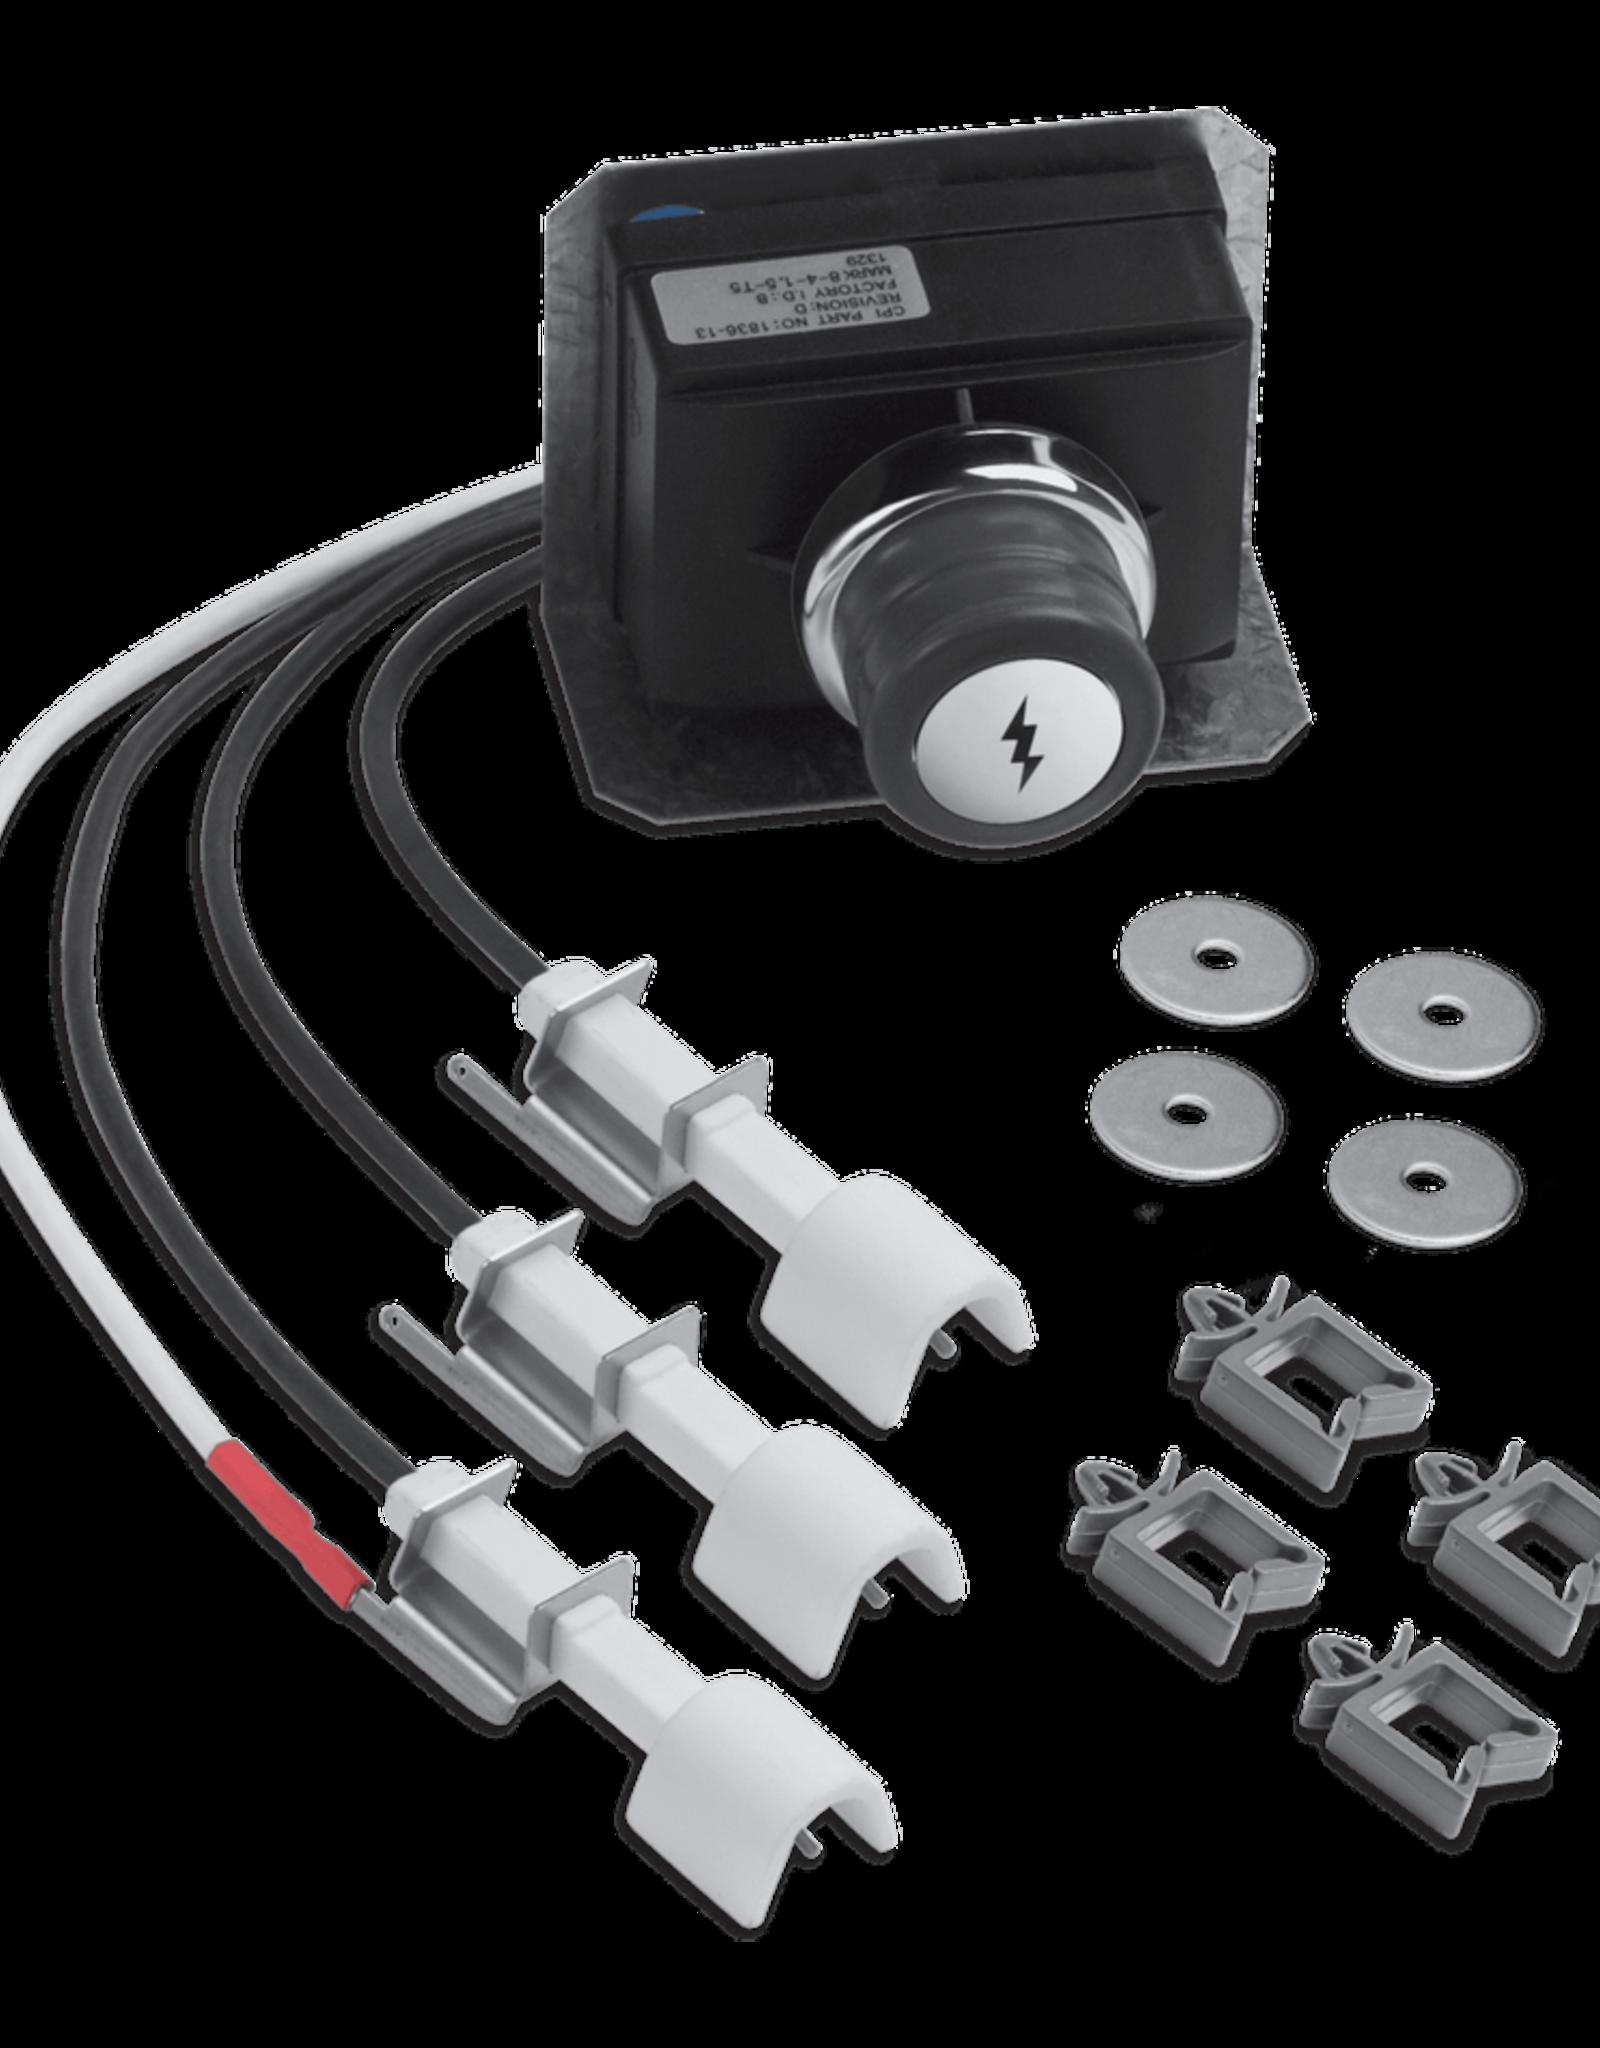 Weber Igniter Kit - Fits Genesis 310 & 320 (front mount control panel)